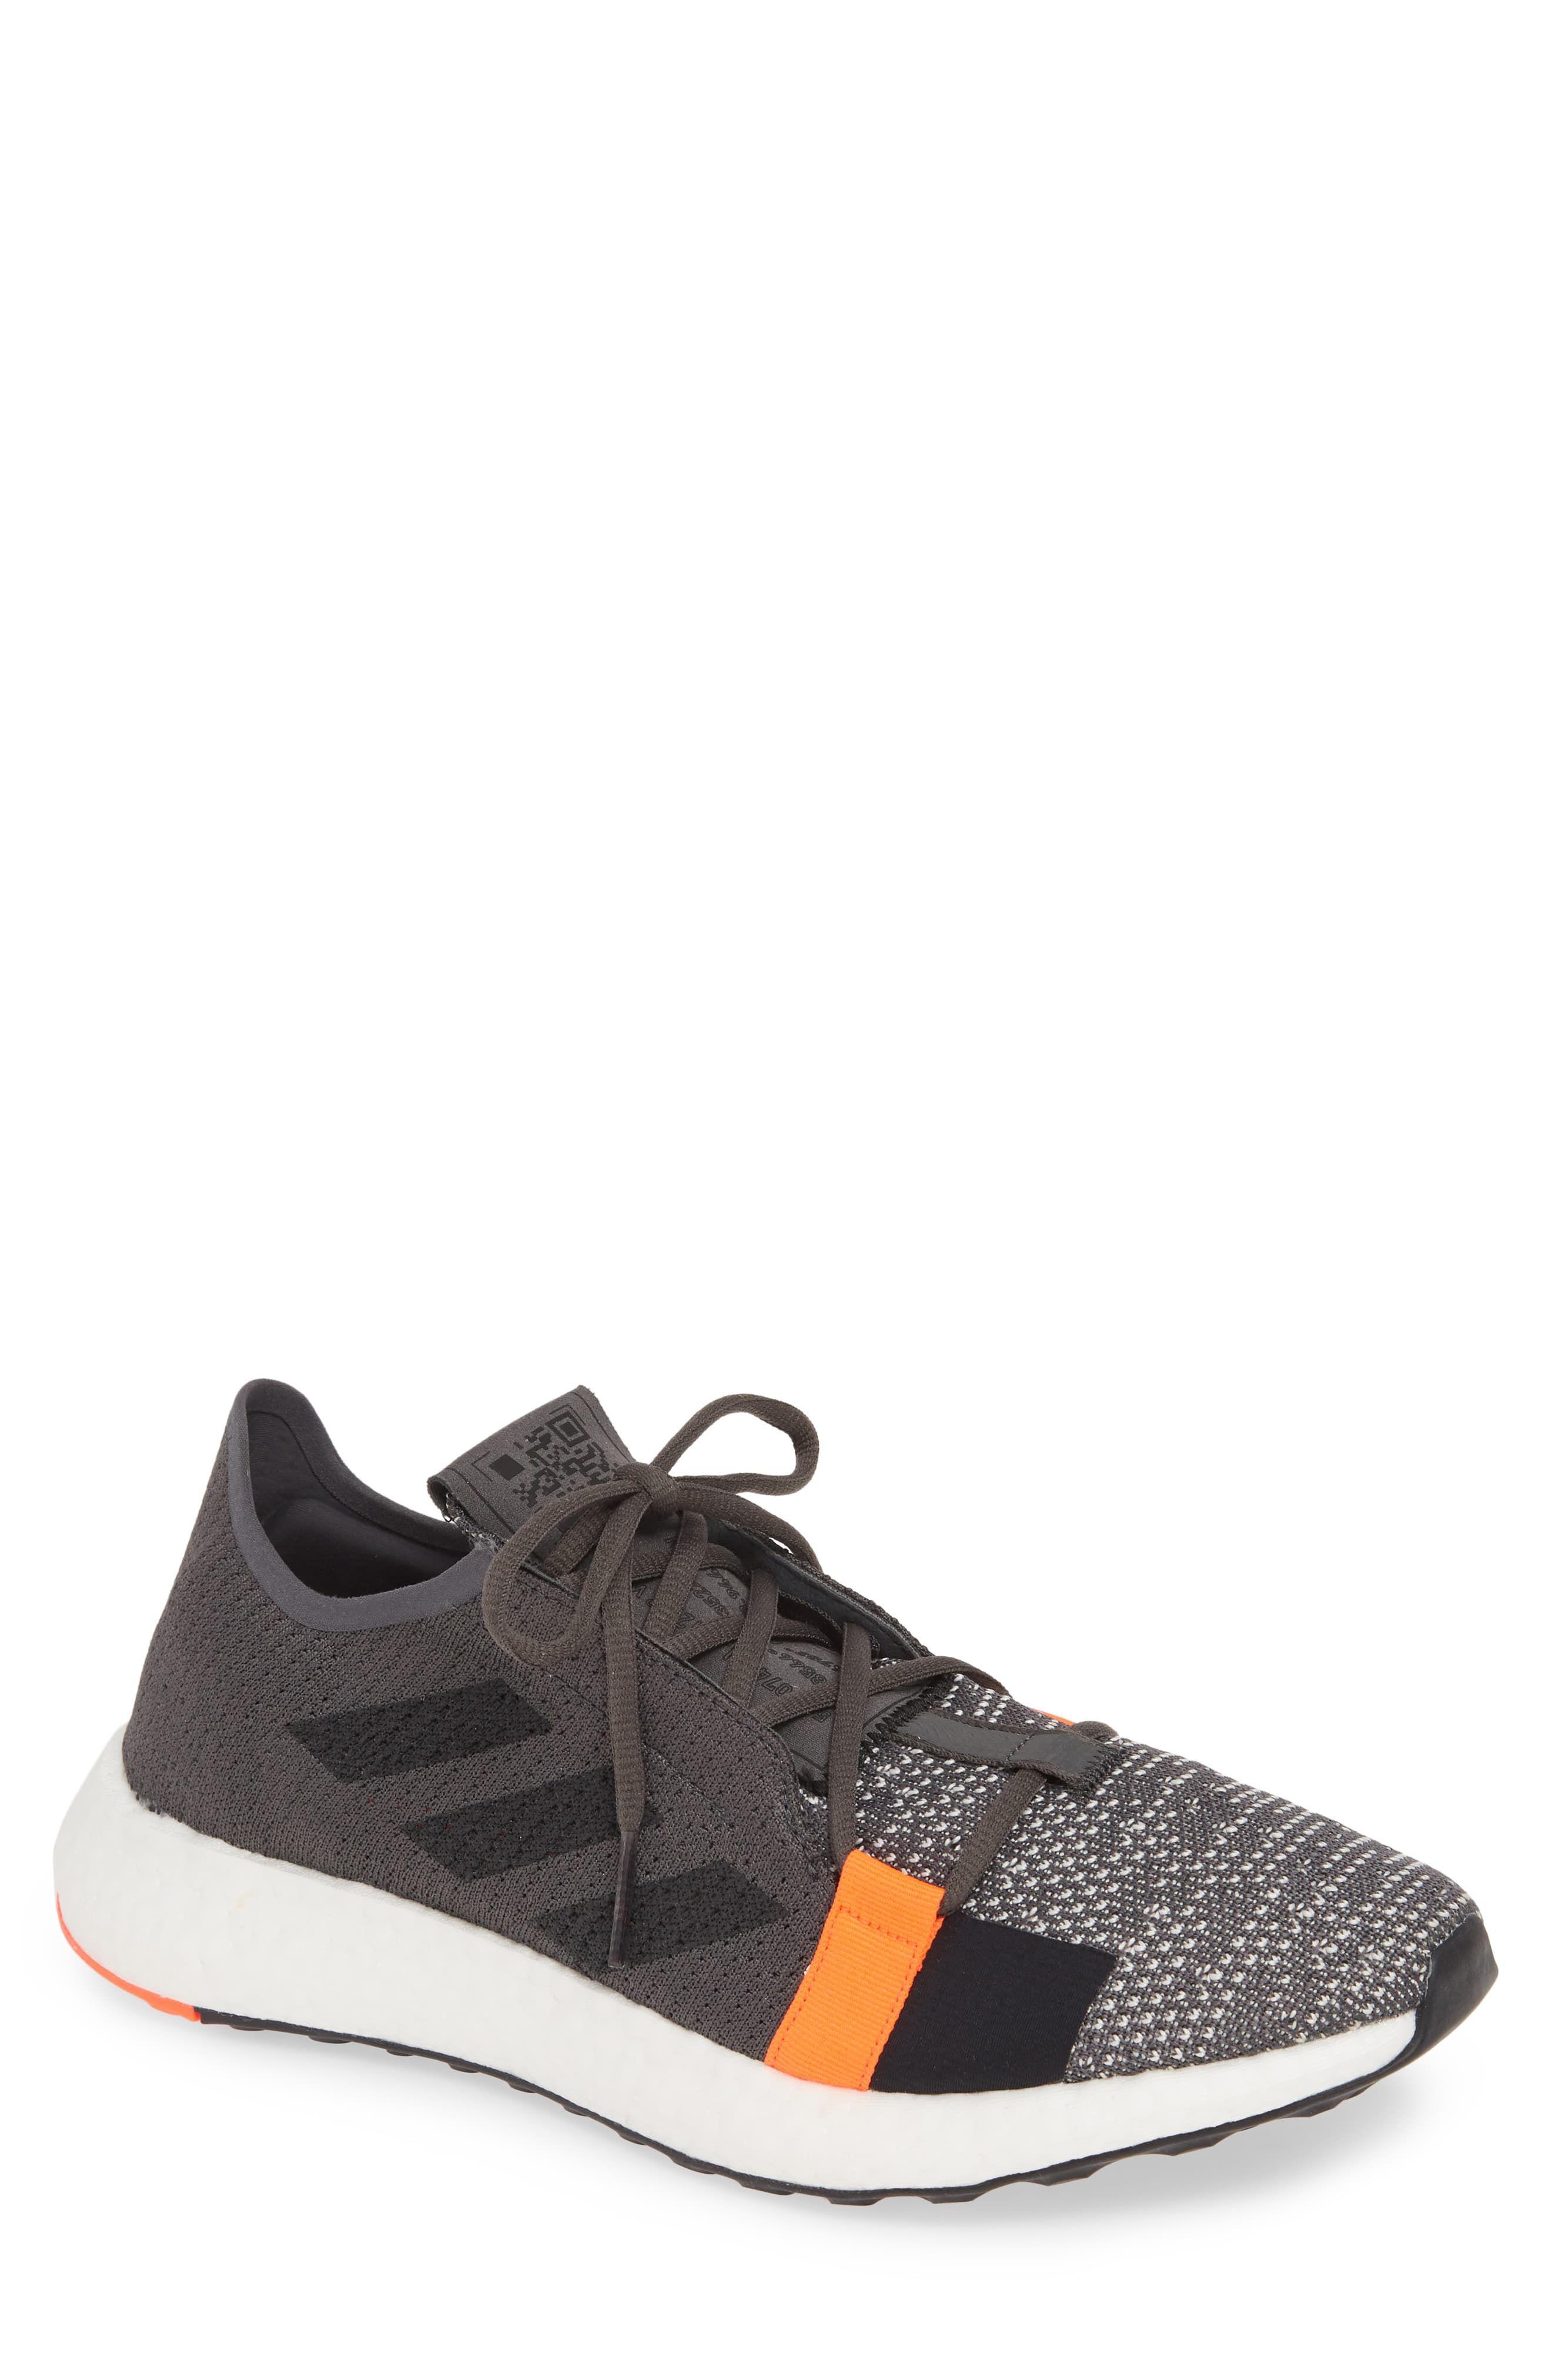 Temblar sensibilidad Archivo  adidas SenseBoost Go Running Shoe (Men | Running shoes design ...